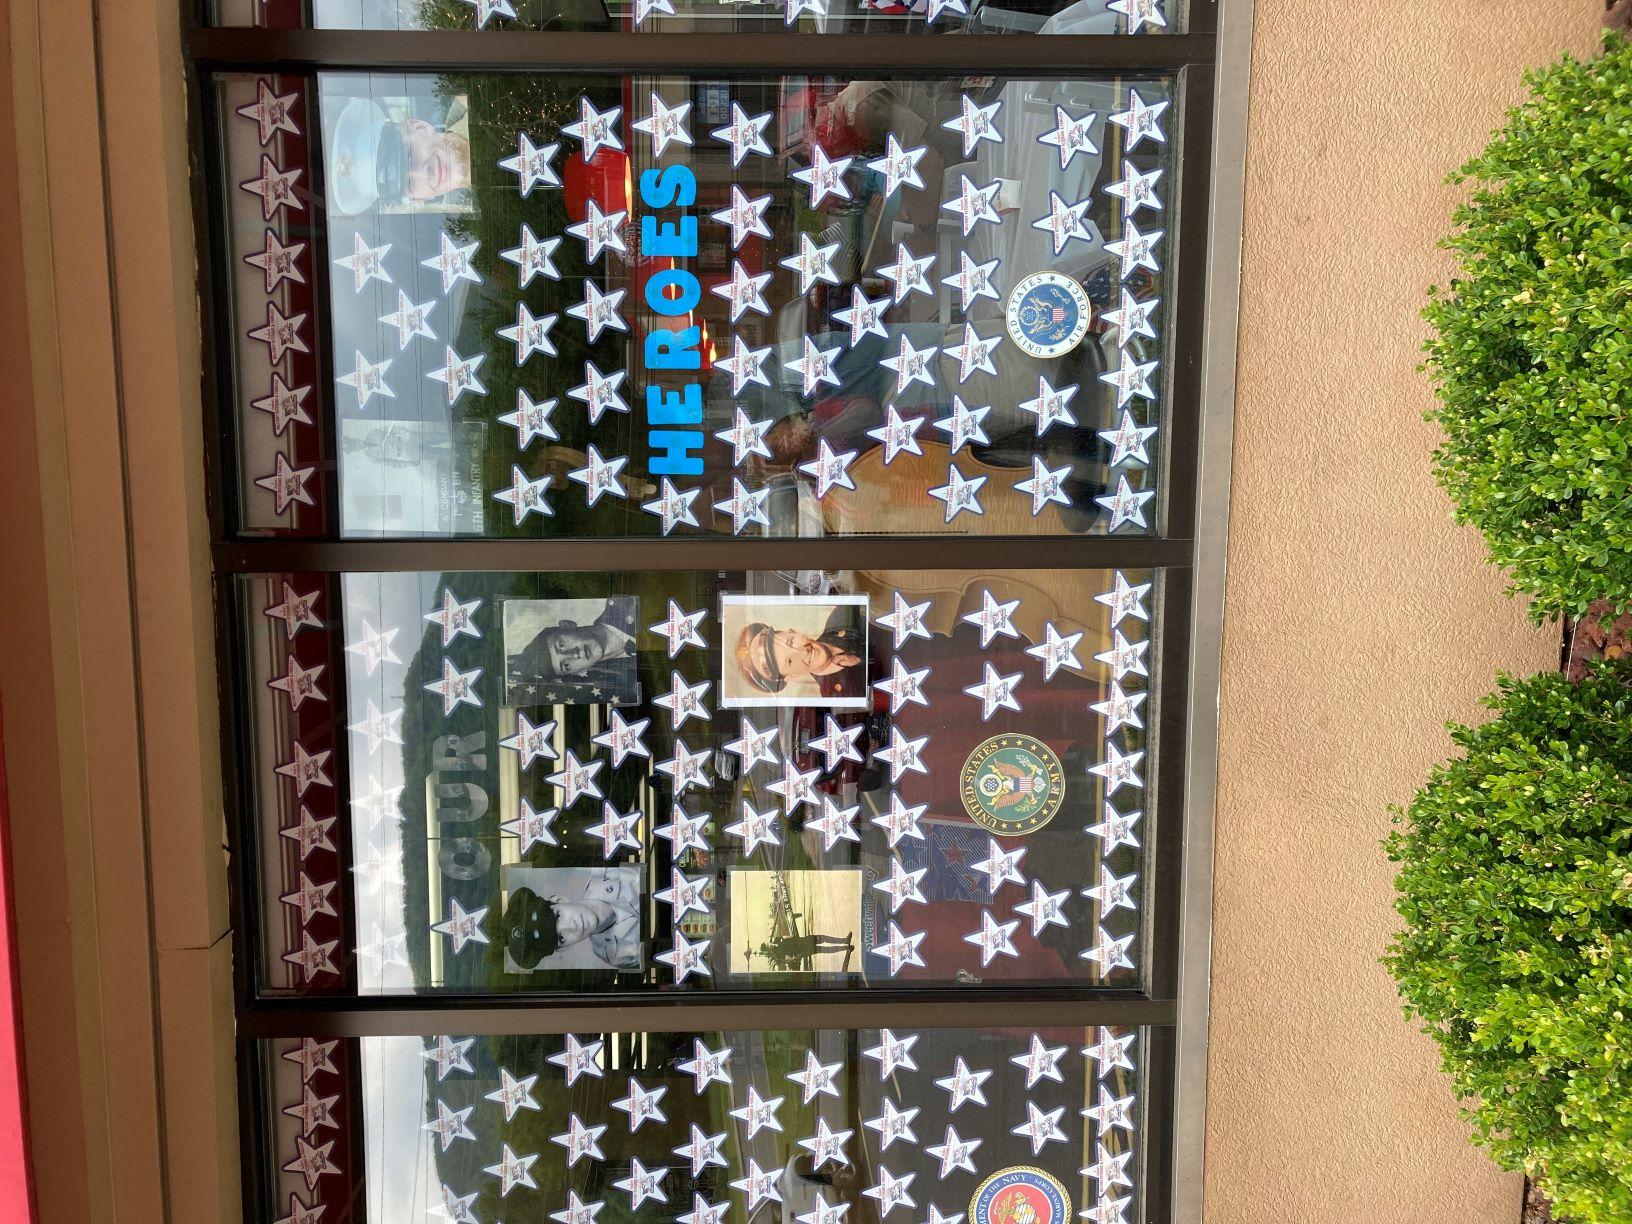 Paper stars in window of local Hardee's